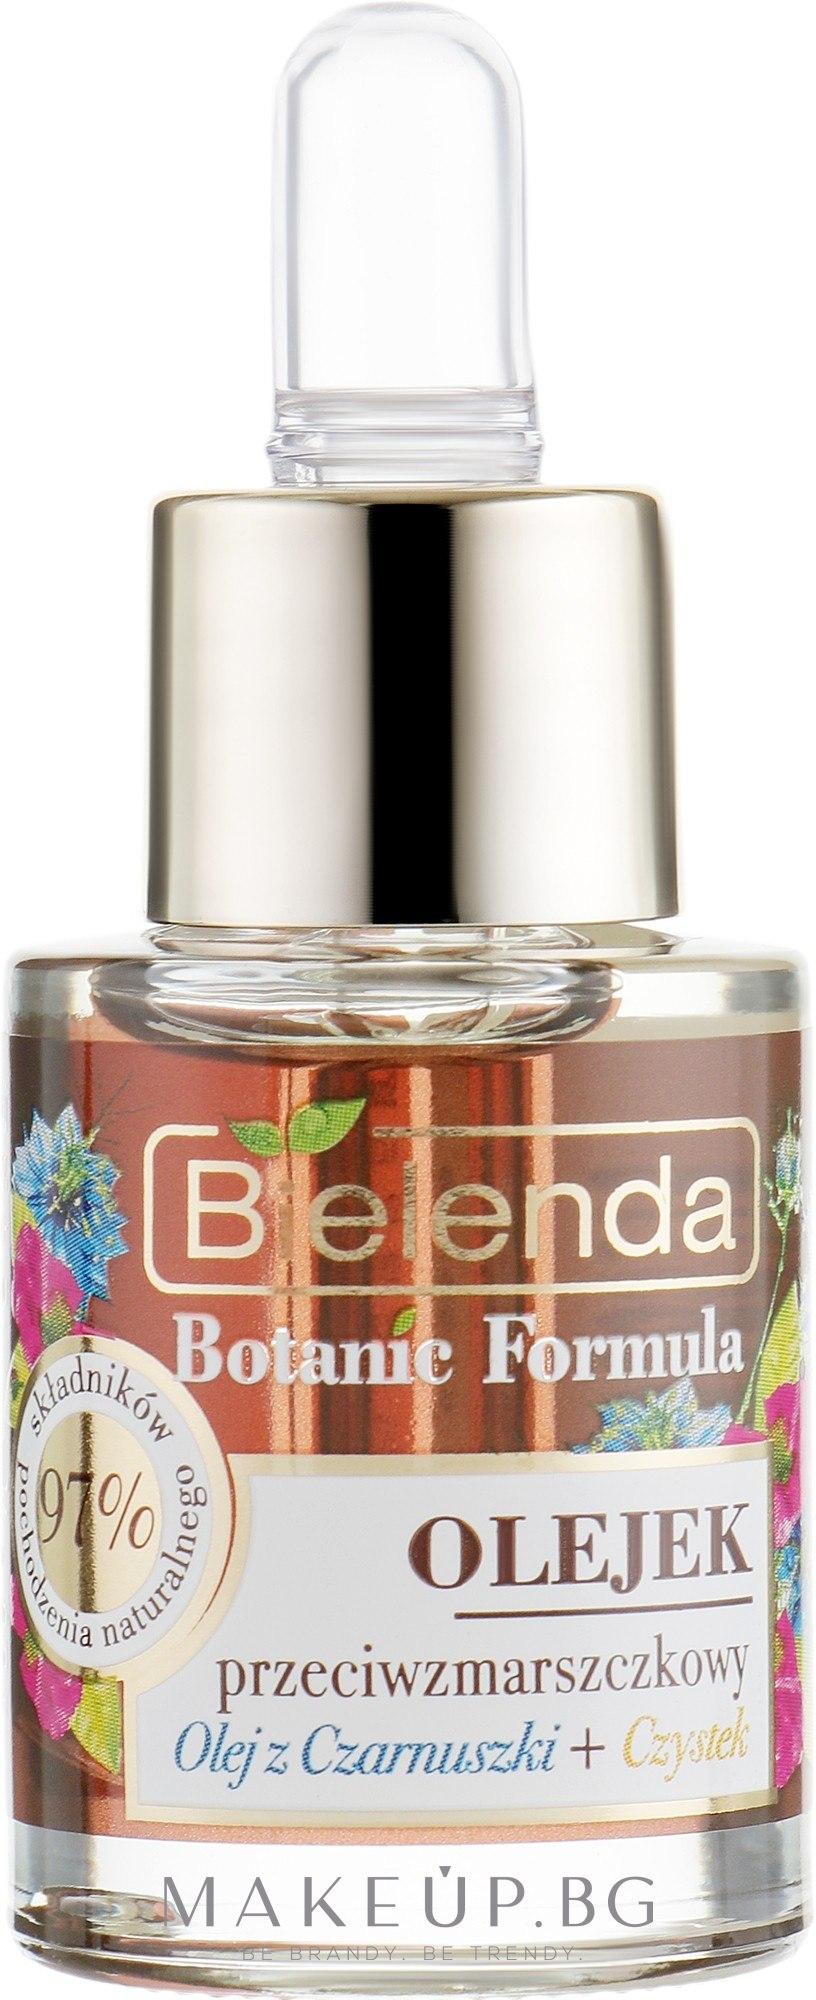 Антистареещо масло за лице - Bielenda Botanic Formula Black Seed Oil Cistus Anti-Wrinkle Face Oil — снимка 15 ml